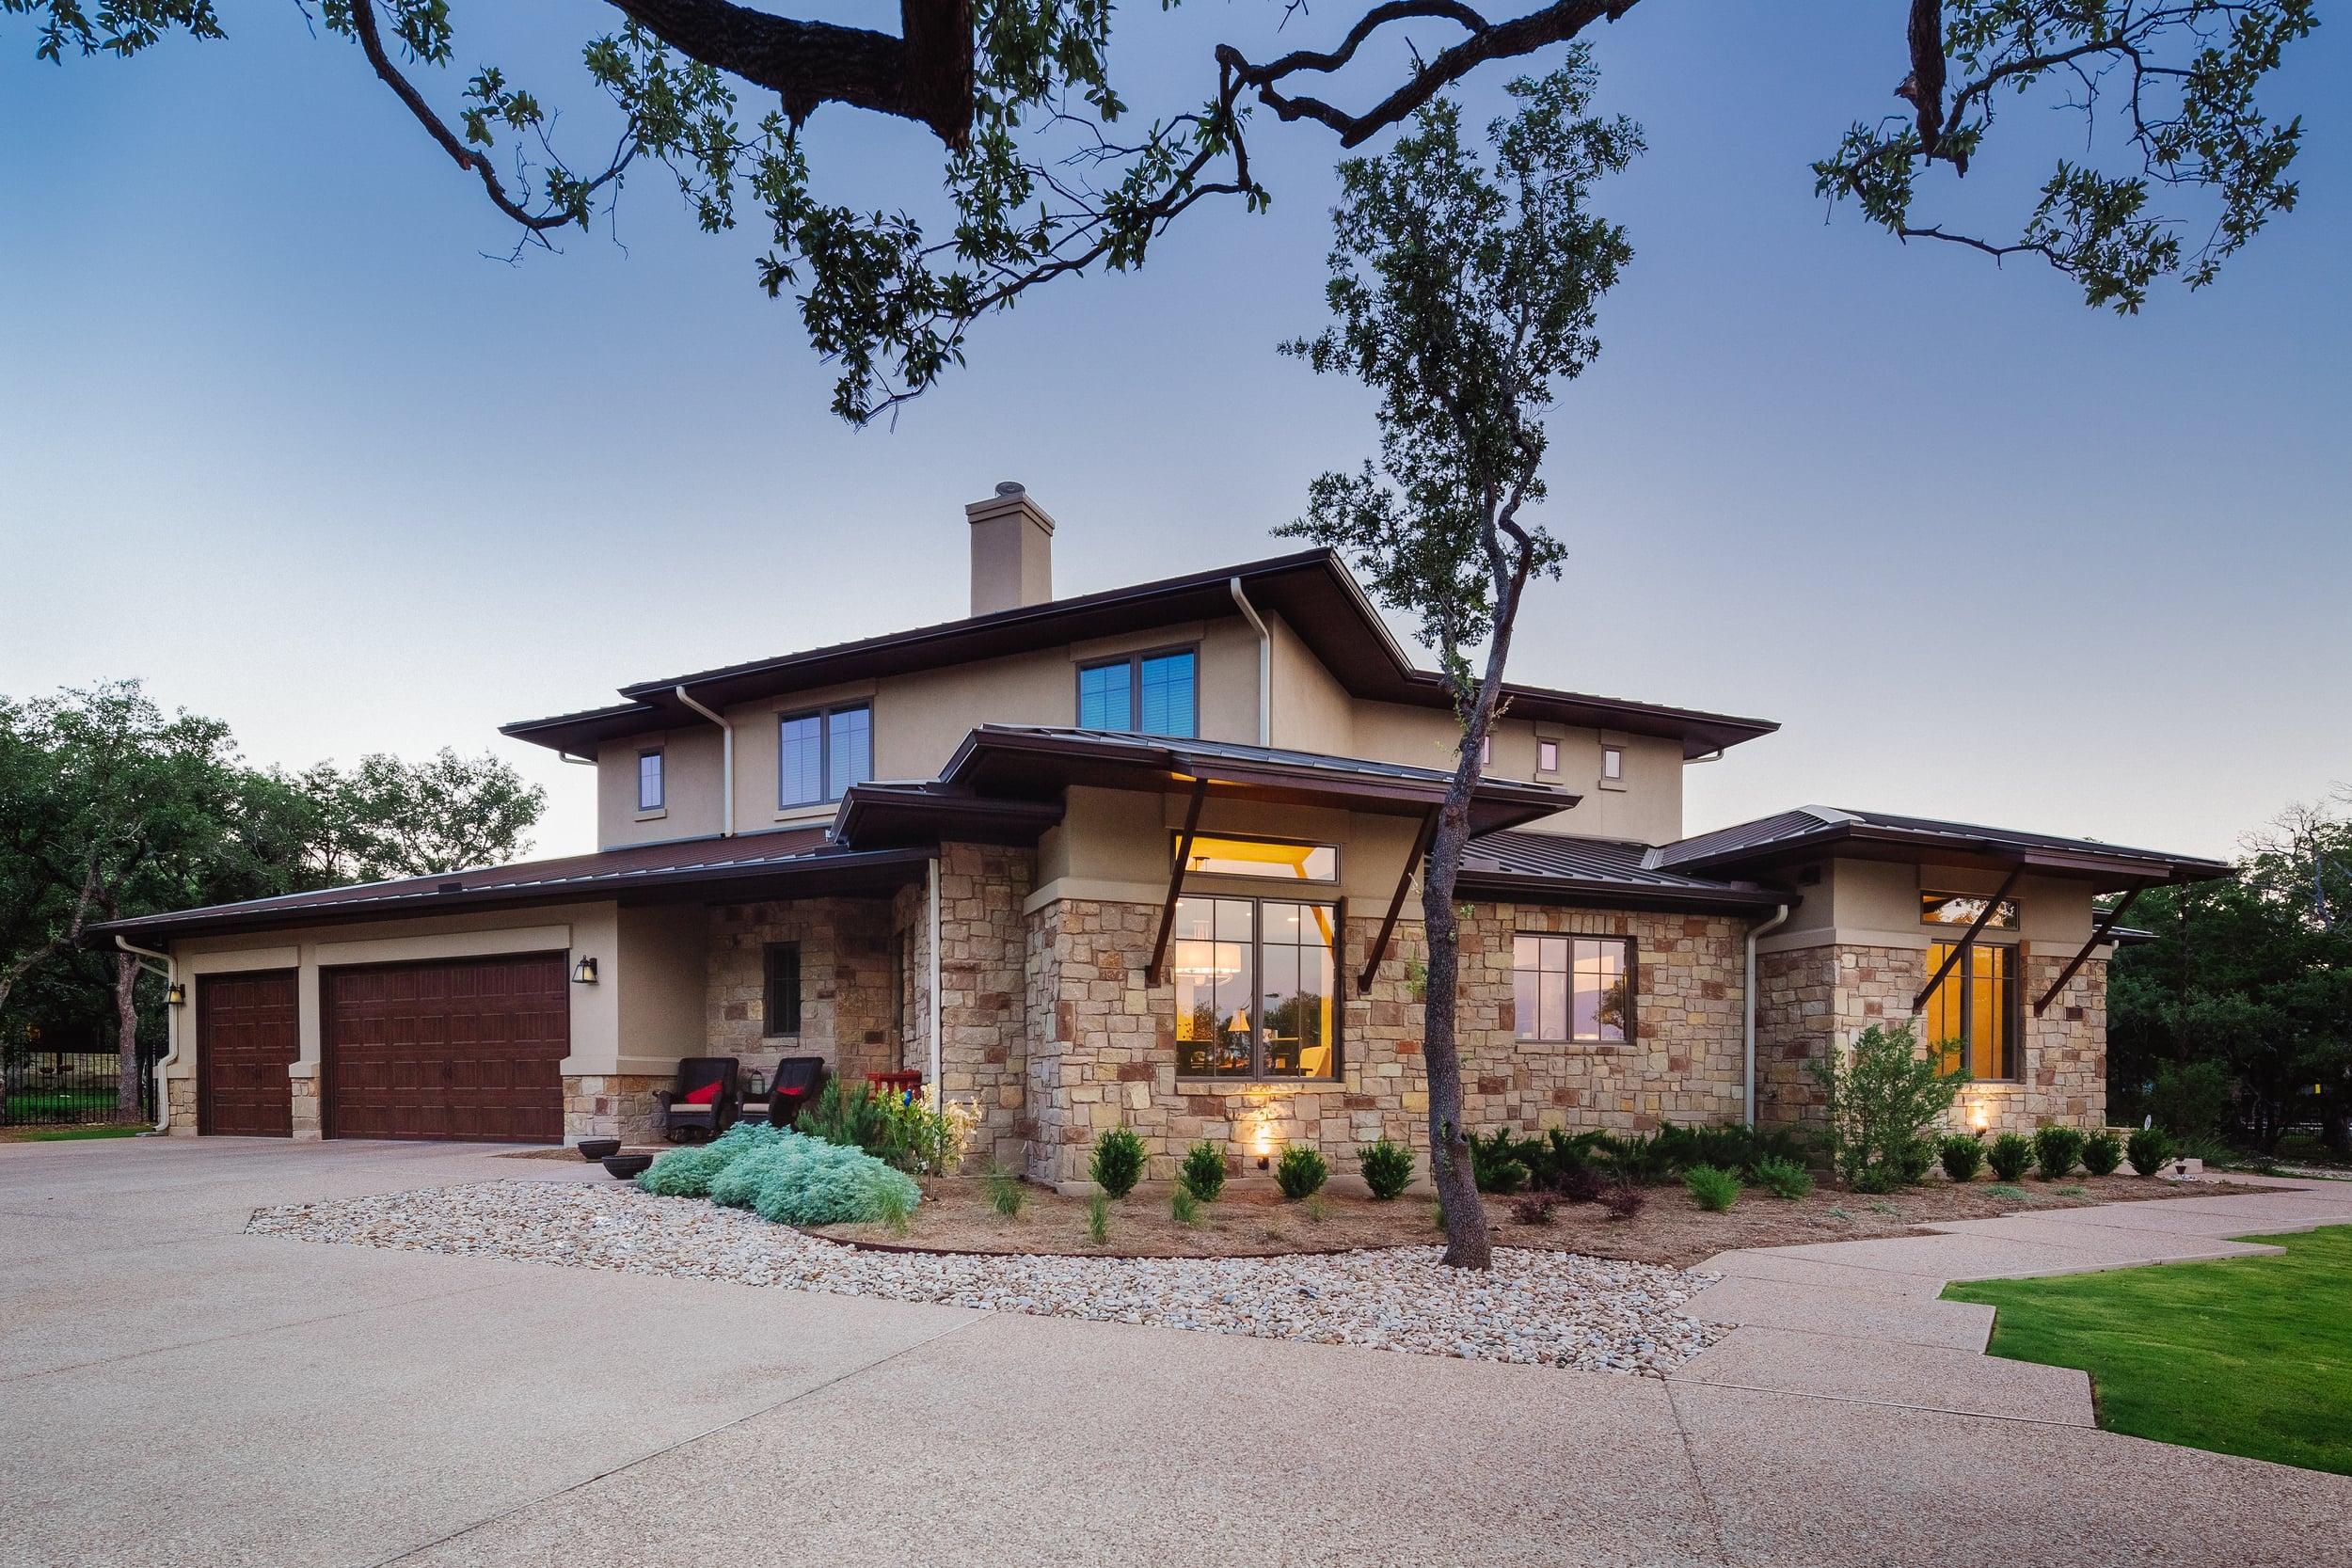 jbryantboyd-innovation-luxury-homes-2.jpg